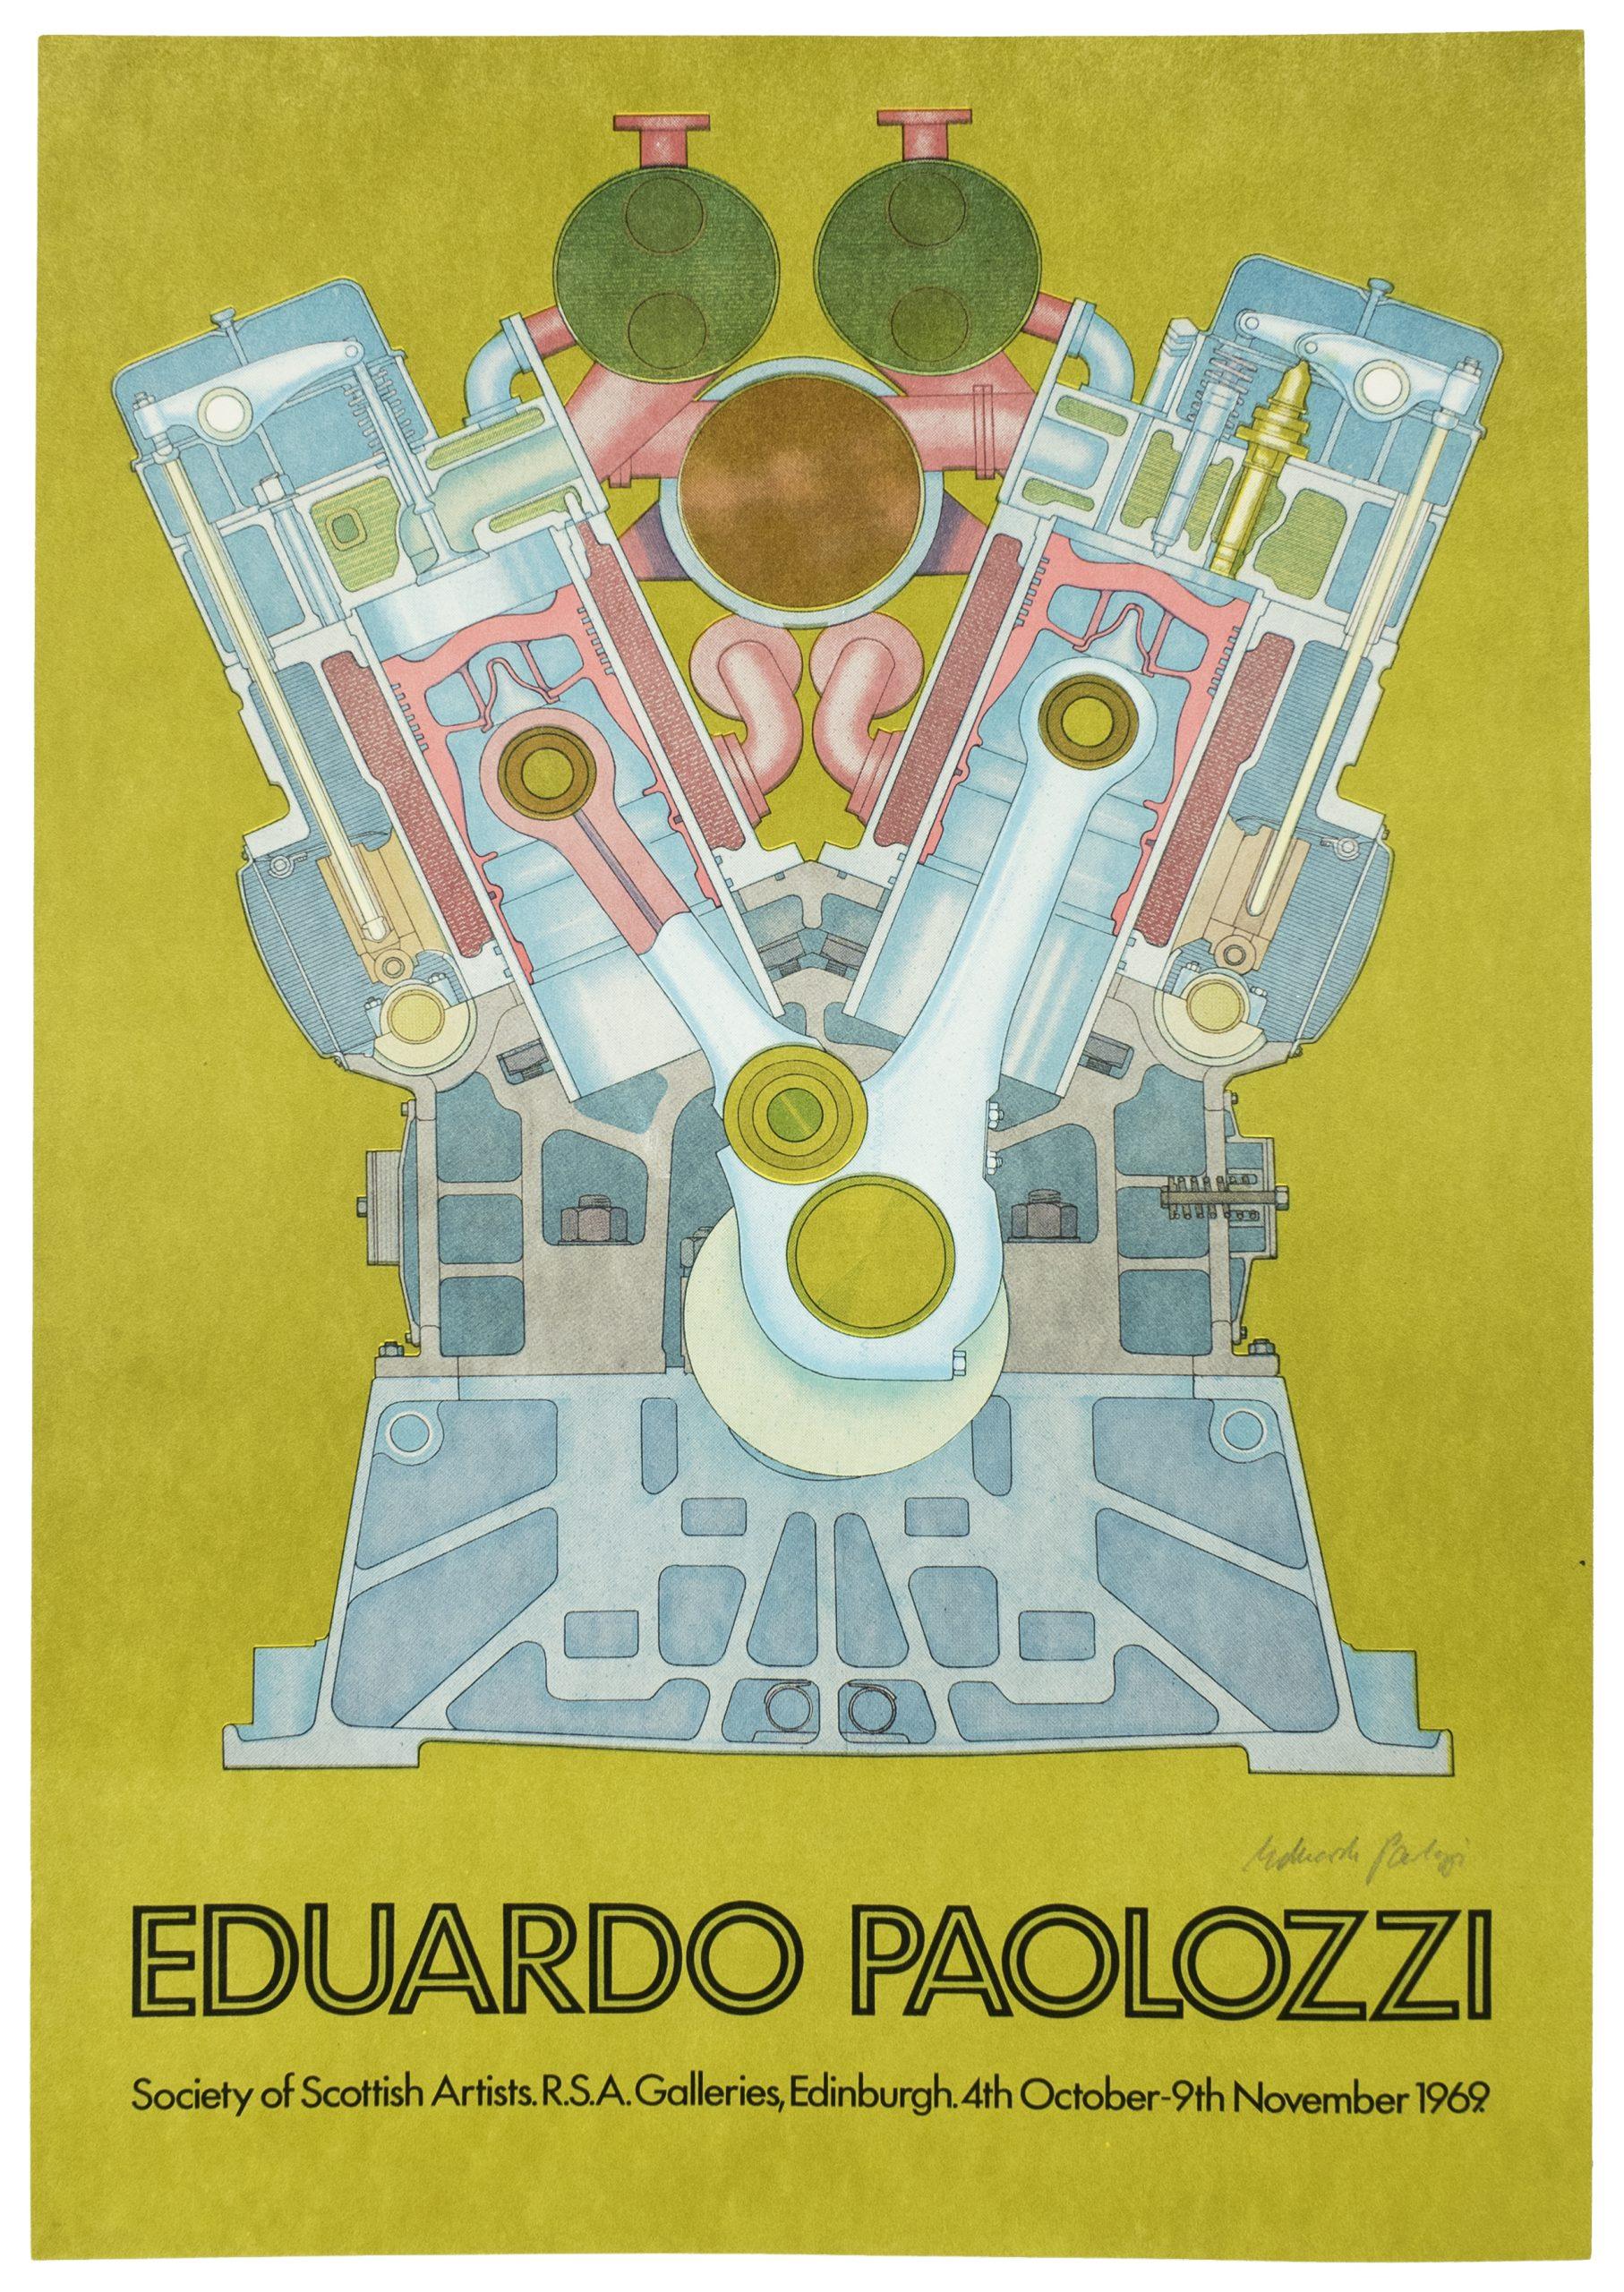 Society of Scottish Artists Exhibition 1969 by Eduardo Paolozzi